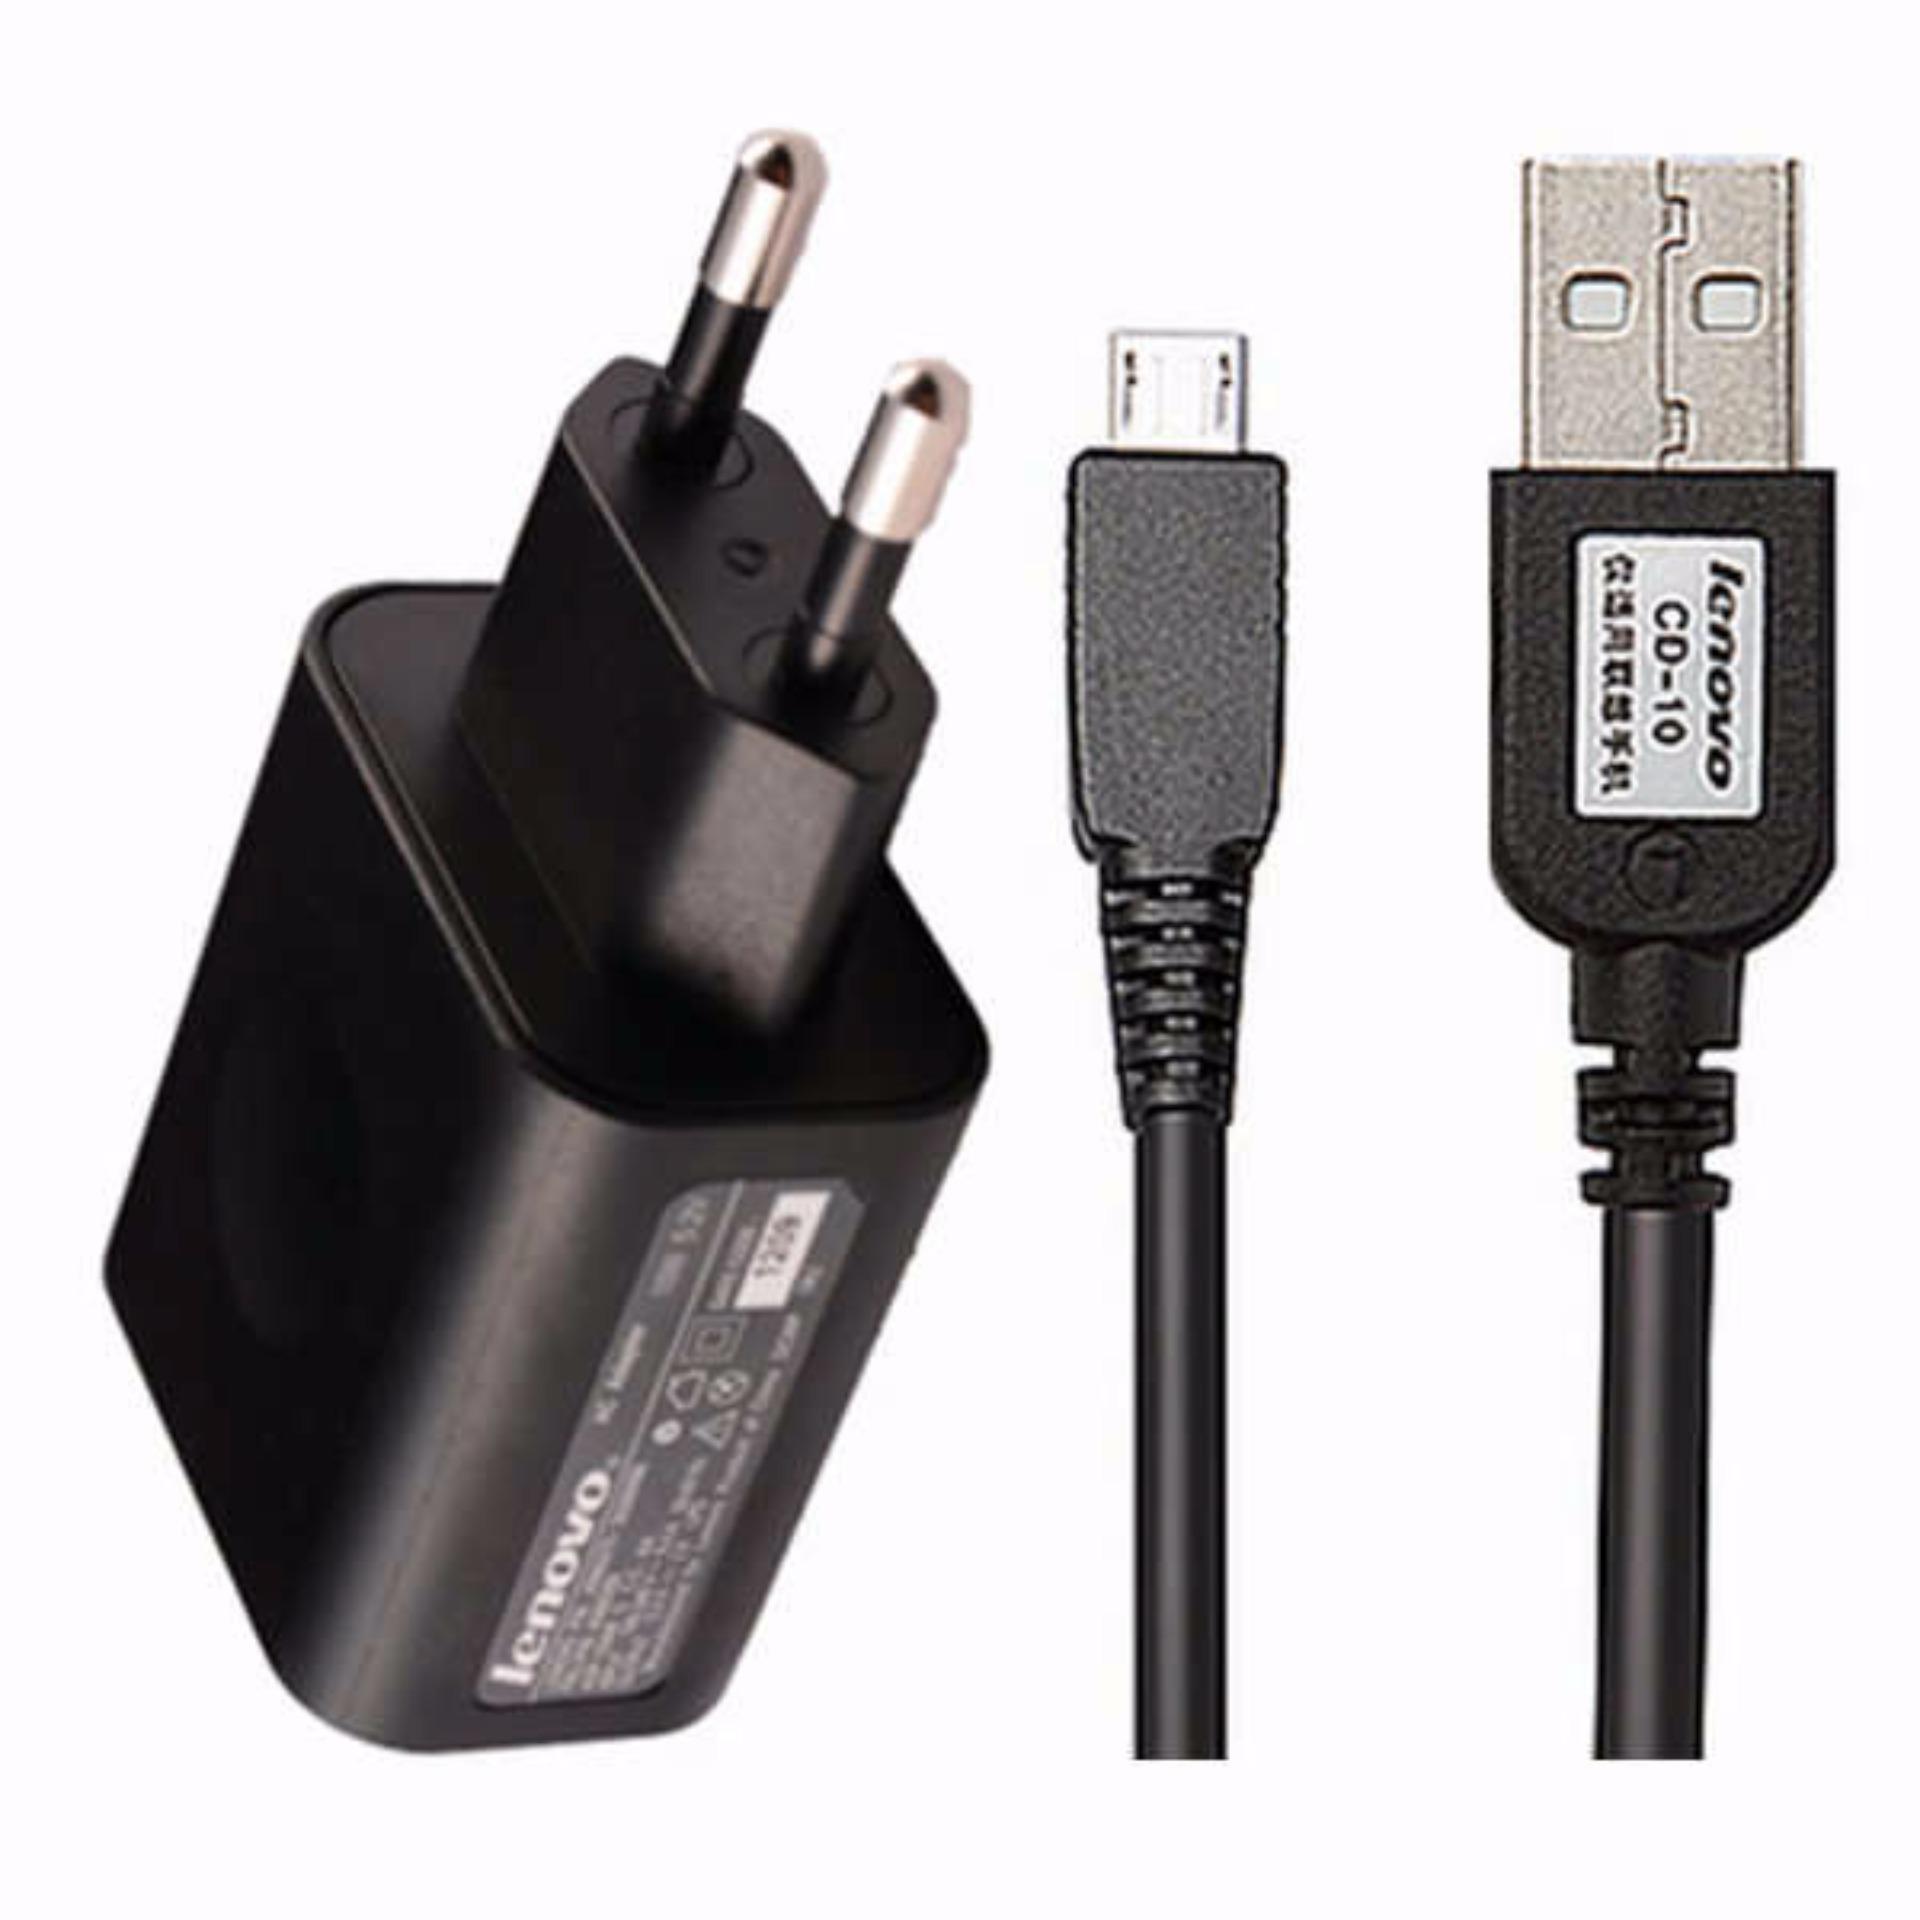 Lenovo Travel Charger 2a C P08 Kabel Micro Usb Original Nonpack P36